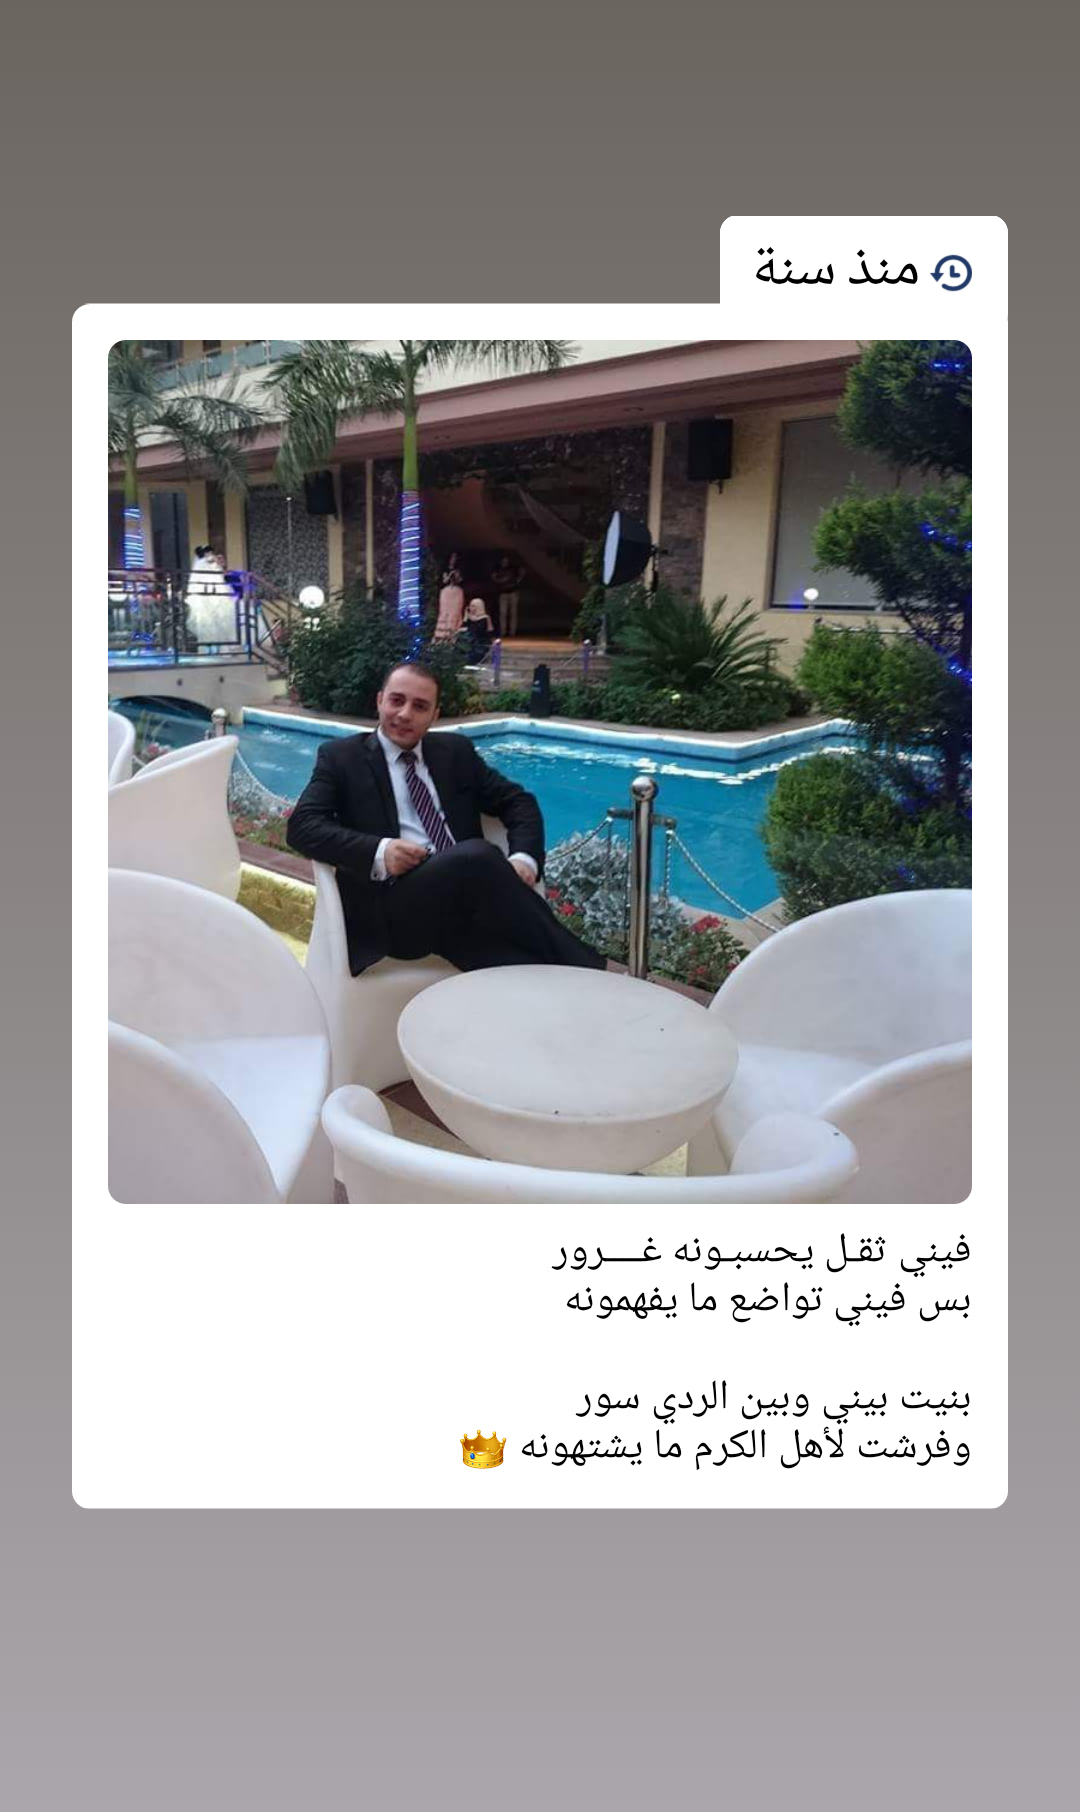 Ahmedsleem Profile Picture